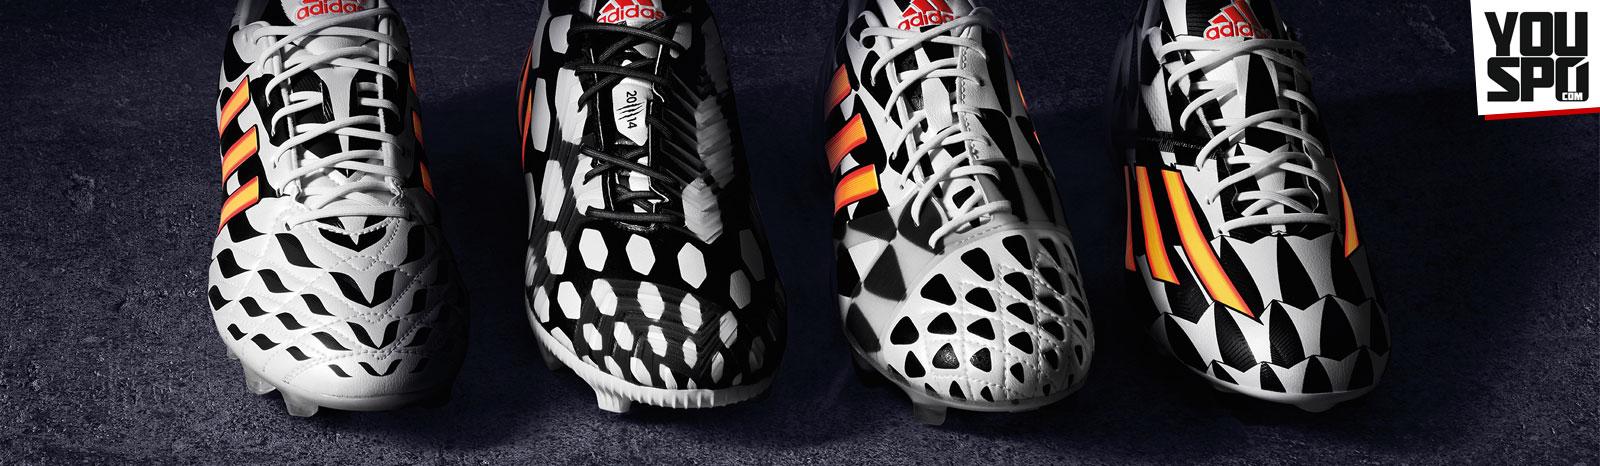 Adidas Battle Pack WM 2014 Fußballschuhe